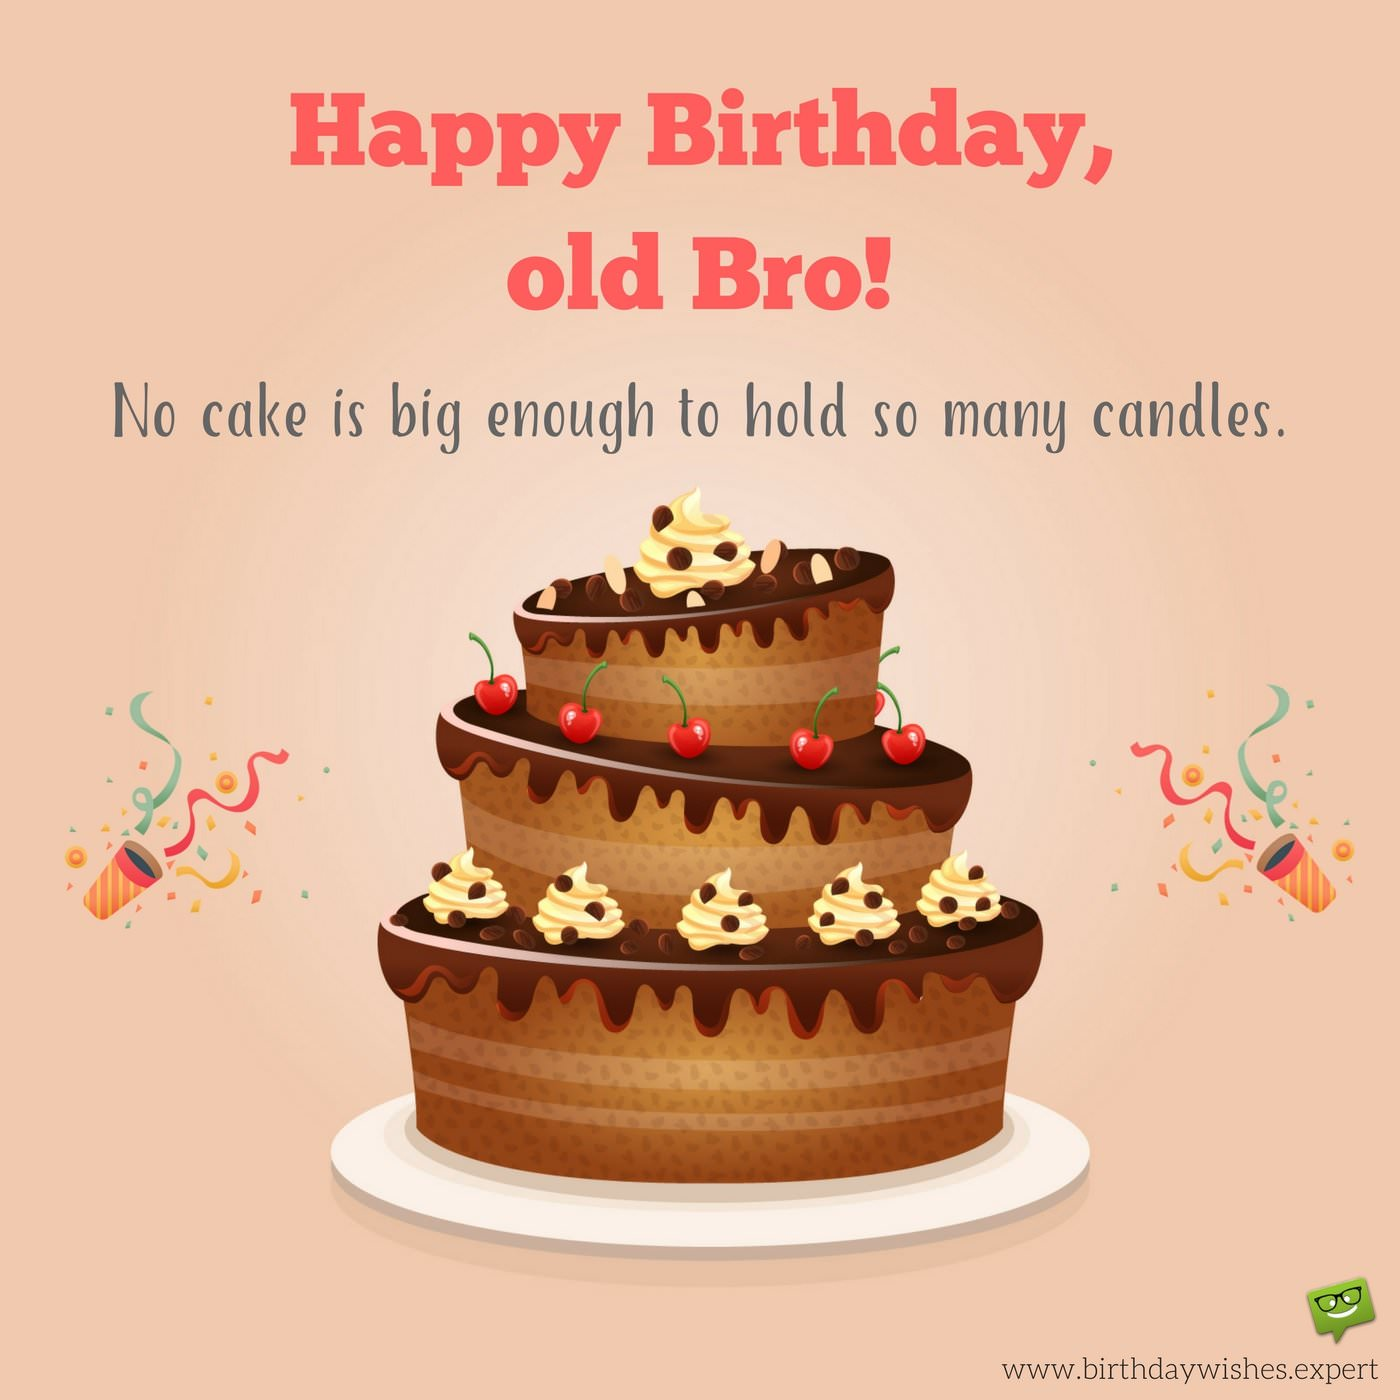 Happy Birthday Old Bro Brother Birthday Wishes